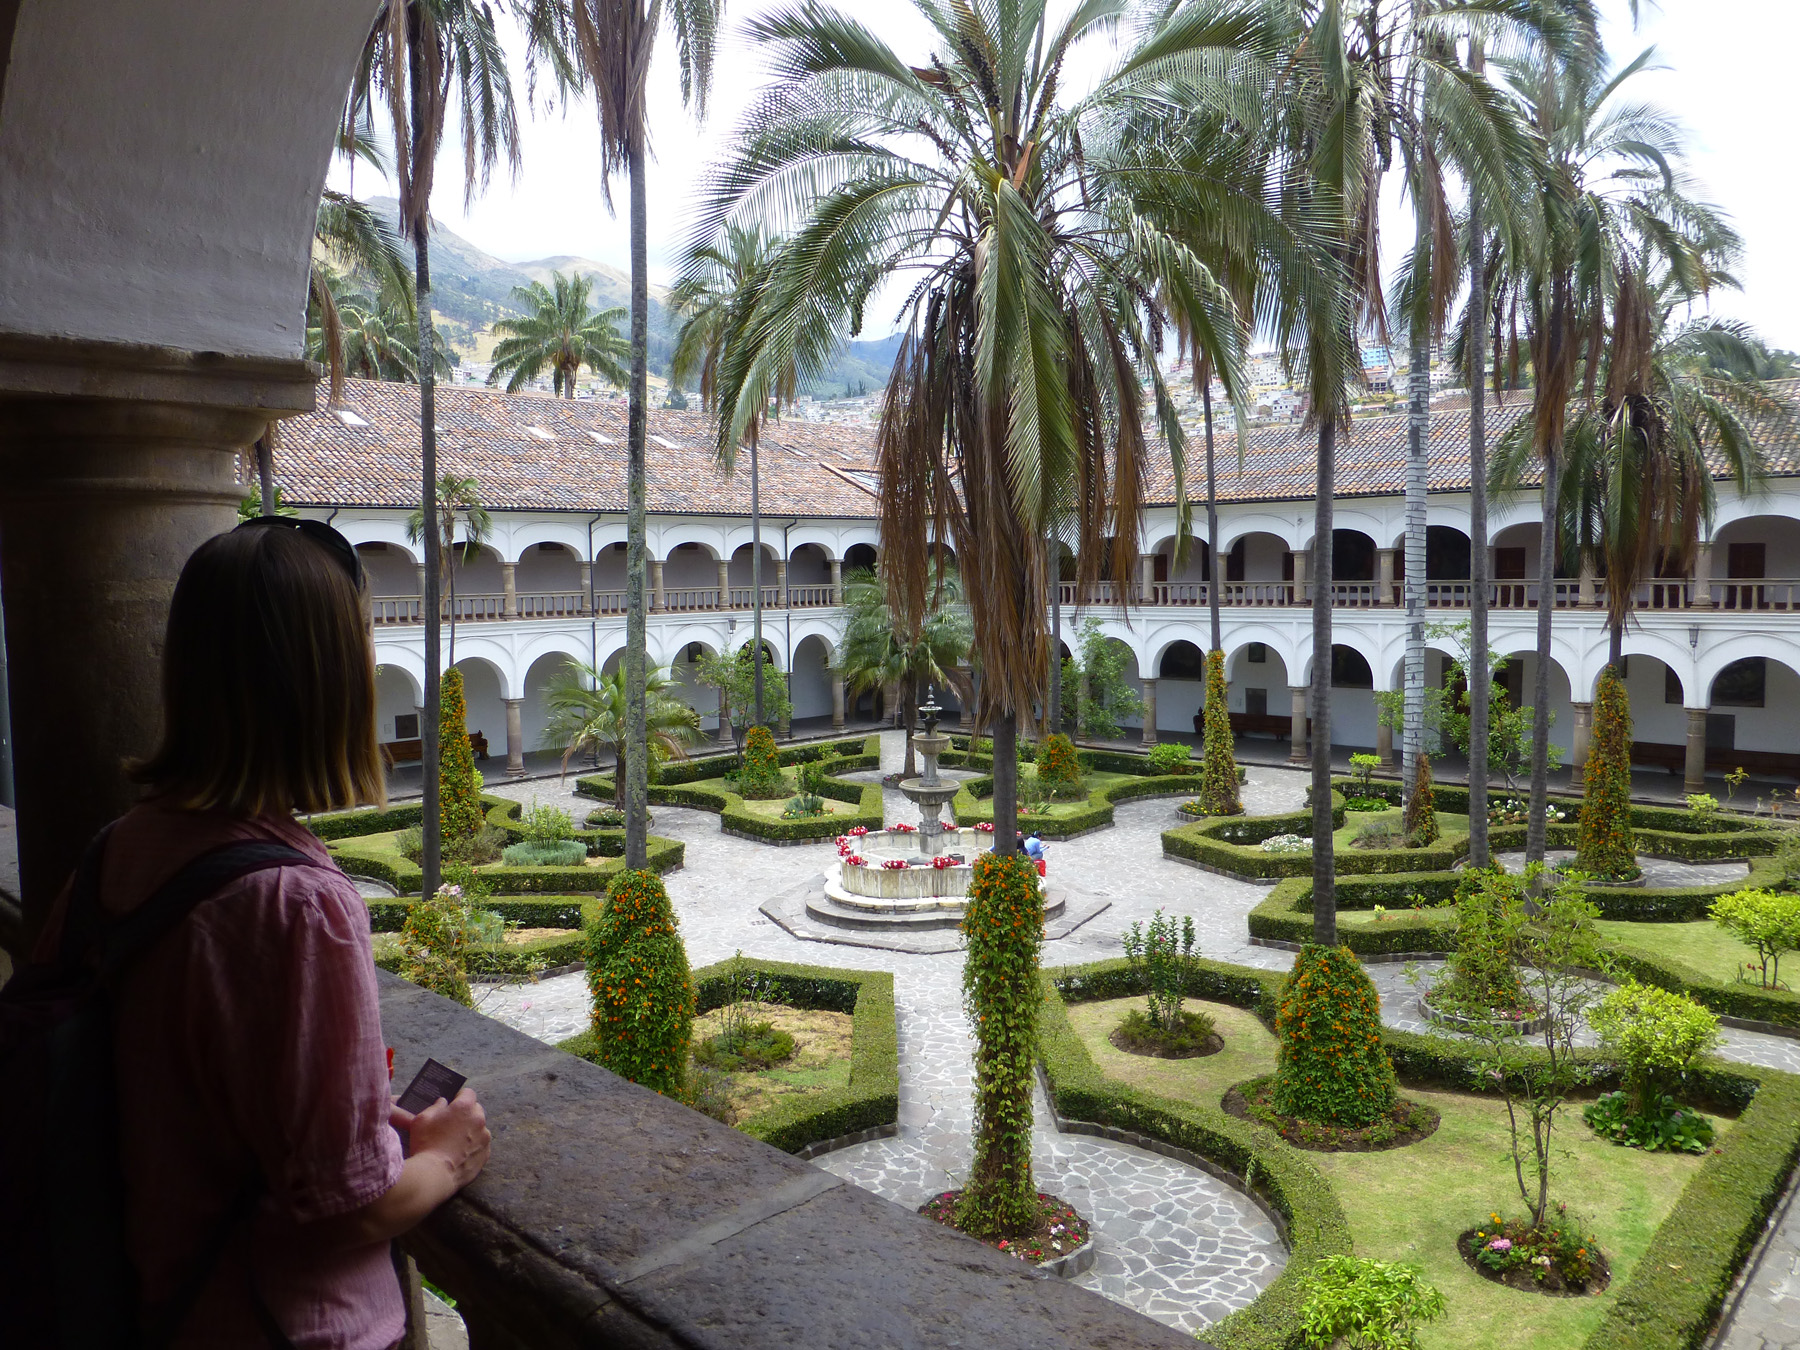 Interior courtyard of the San Francisco Convent